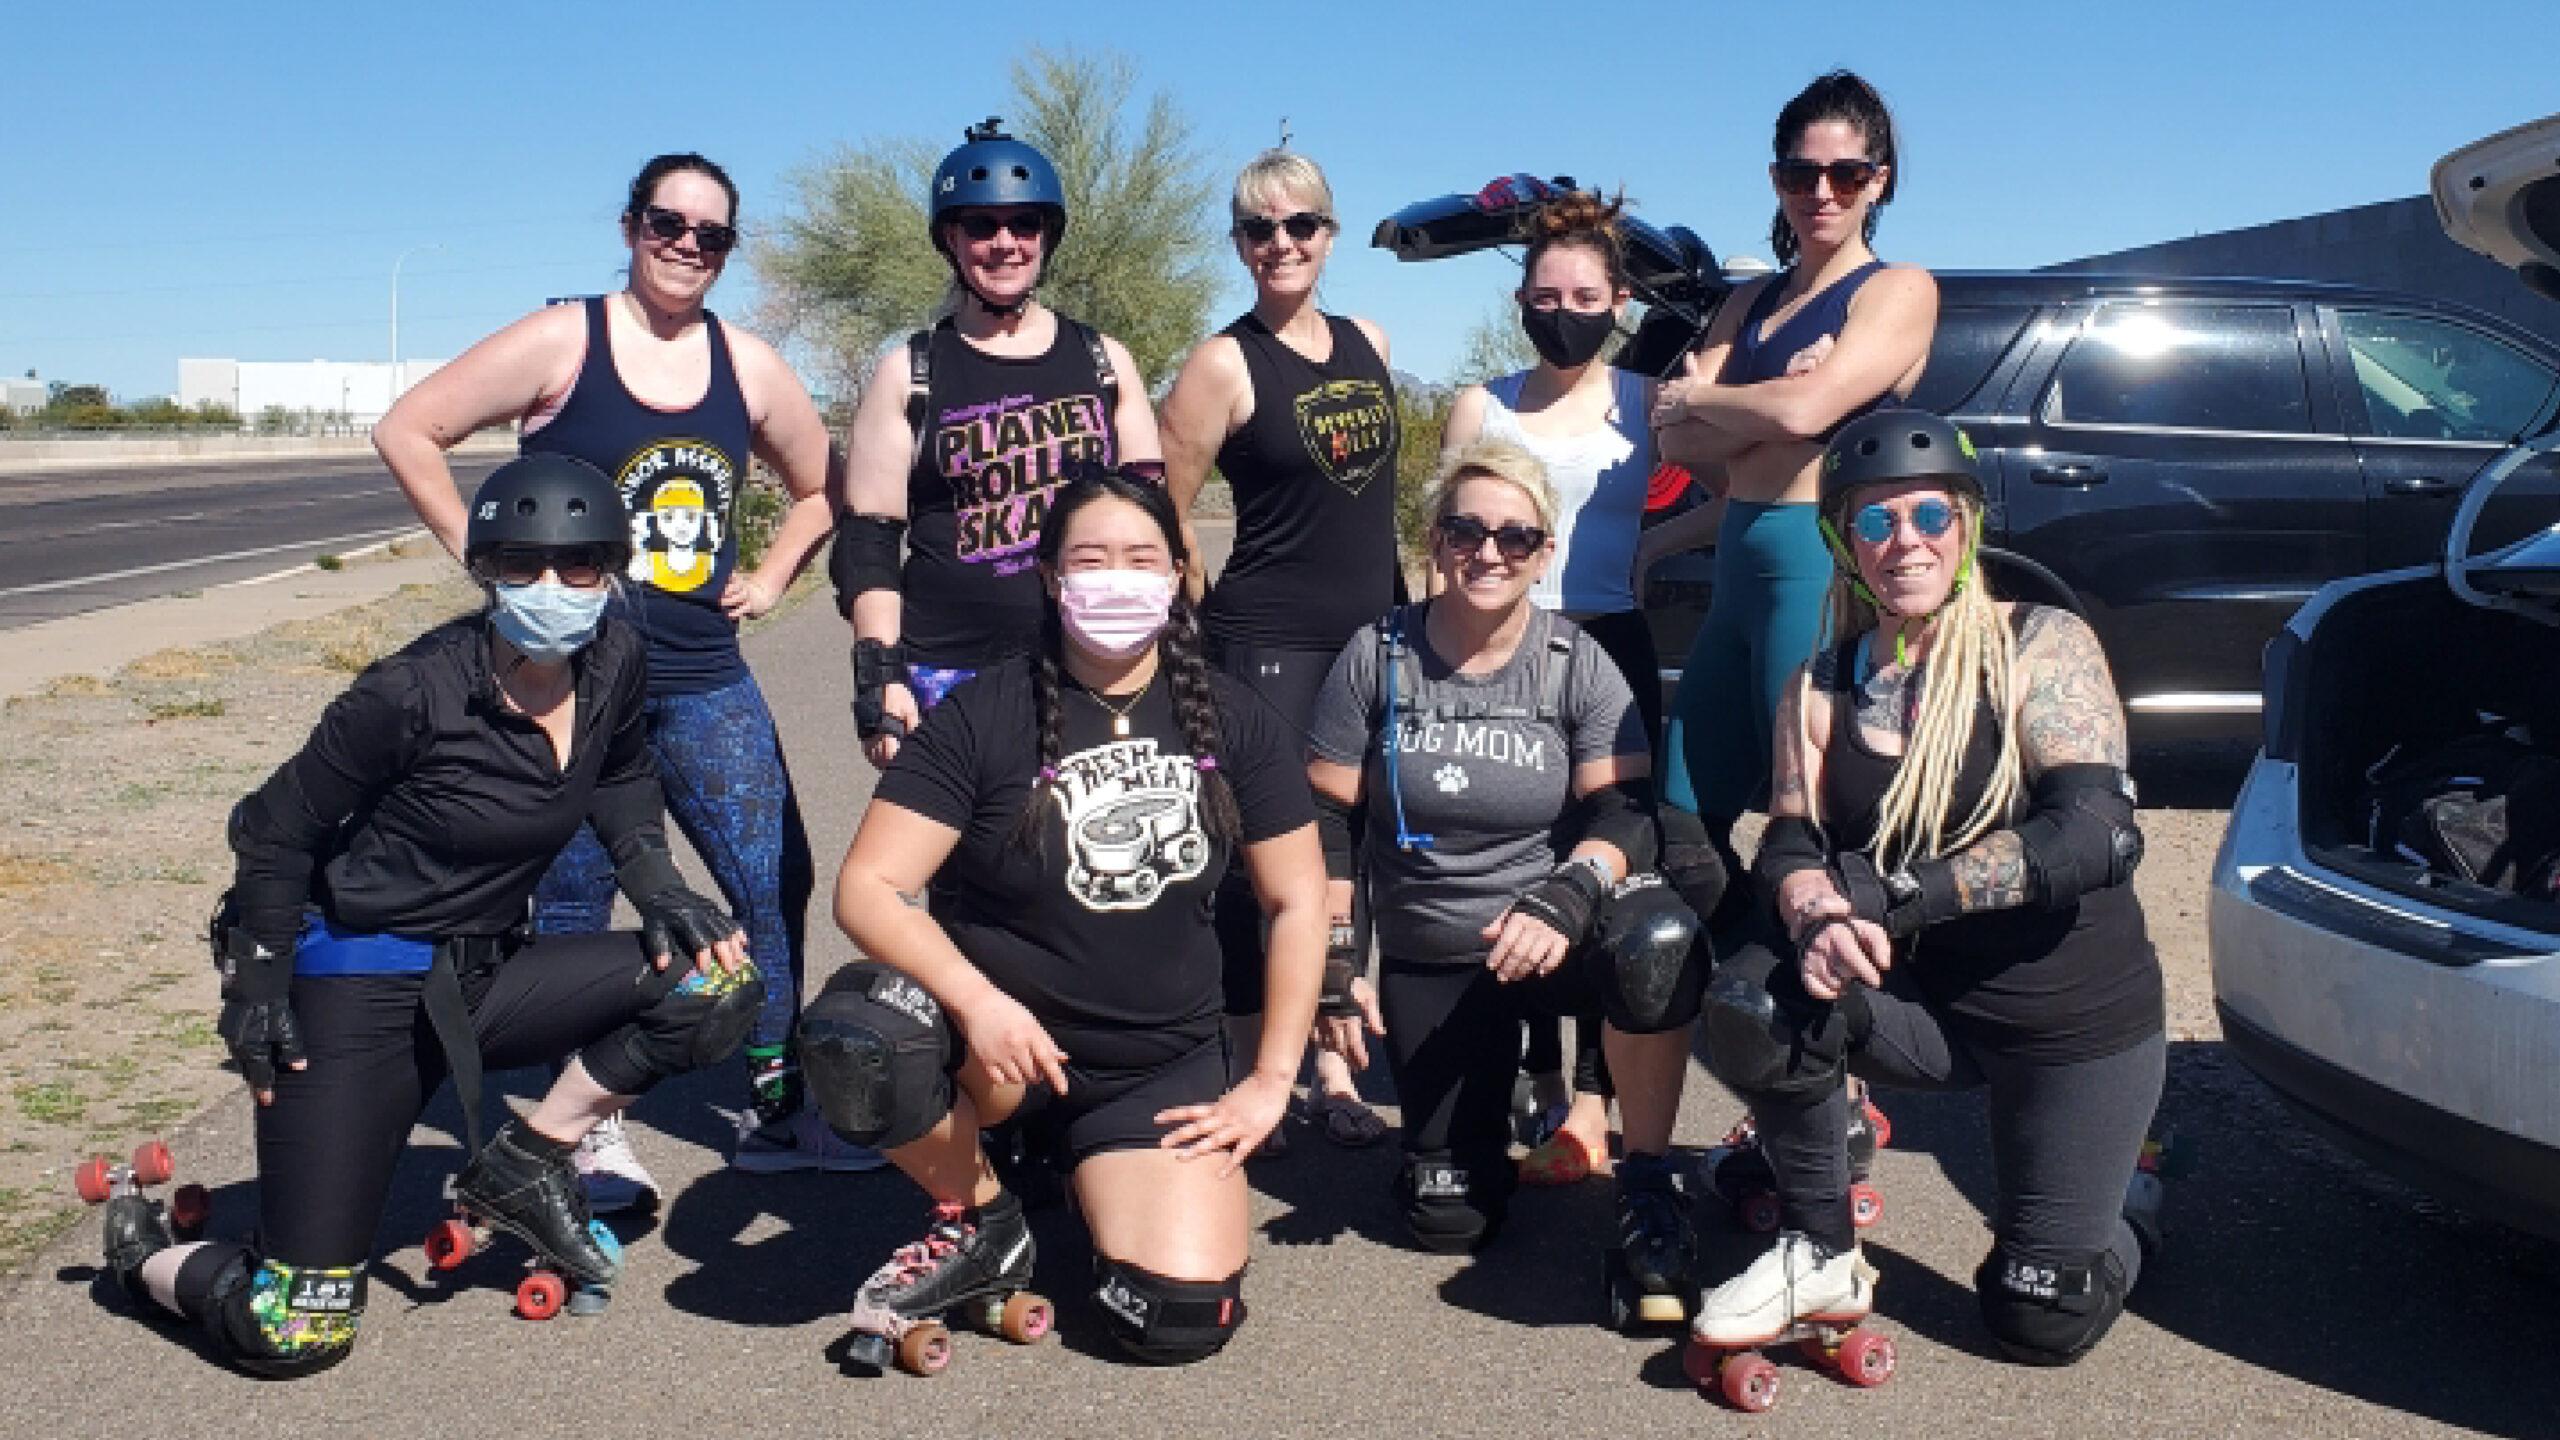 Devoney Looser on the far left, bottom, with Arizona Derby Dames (AZDD) Fresh Meat training team and coaches. (Photo courtesy Devoney Looser)